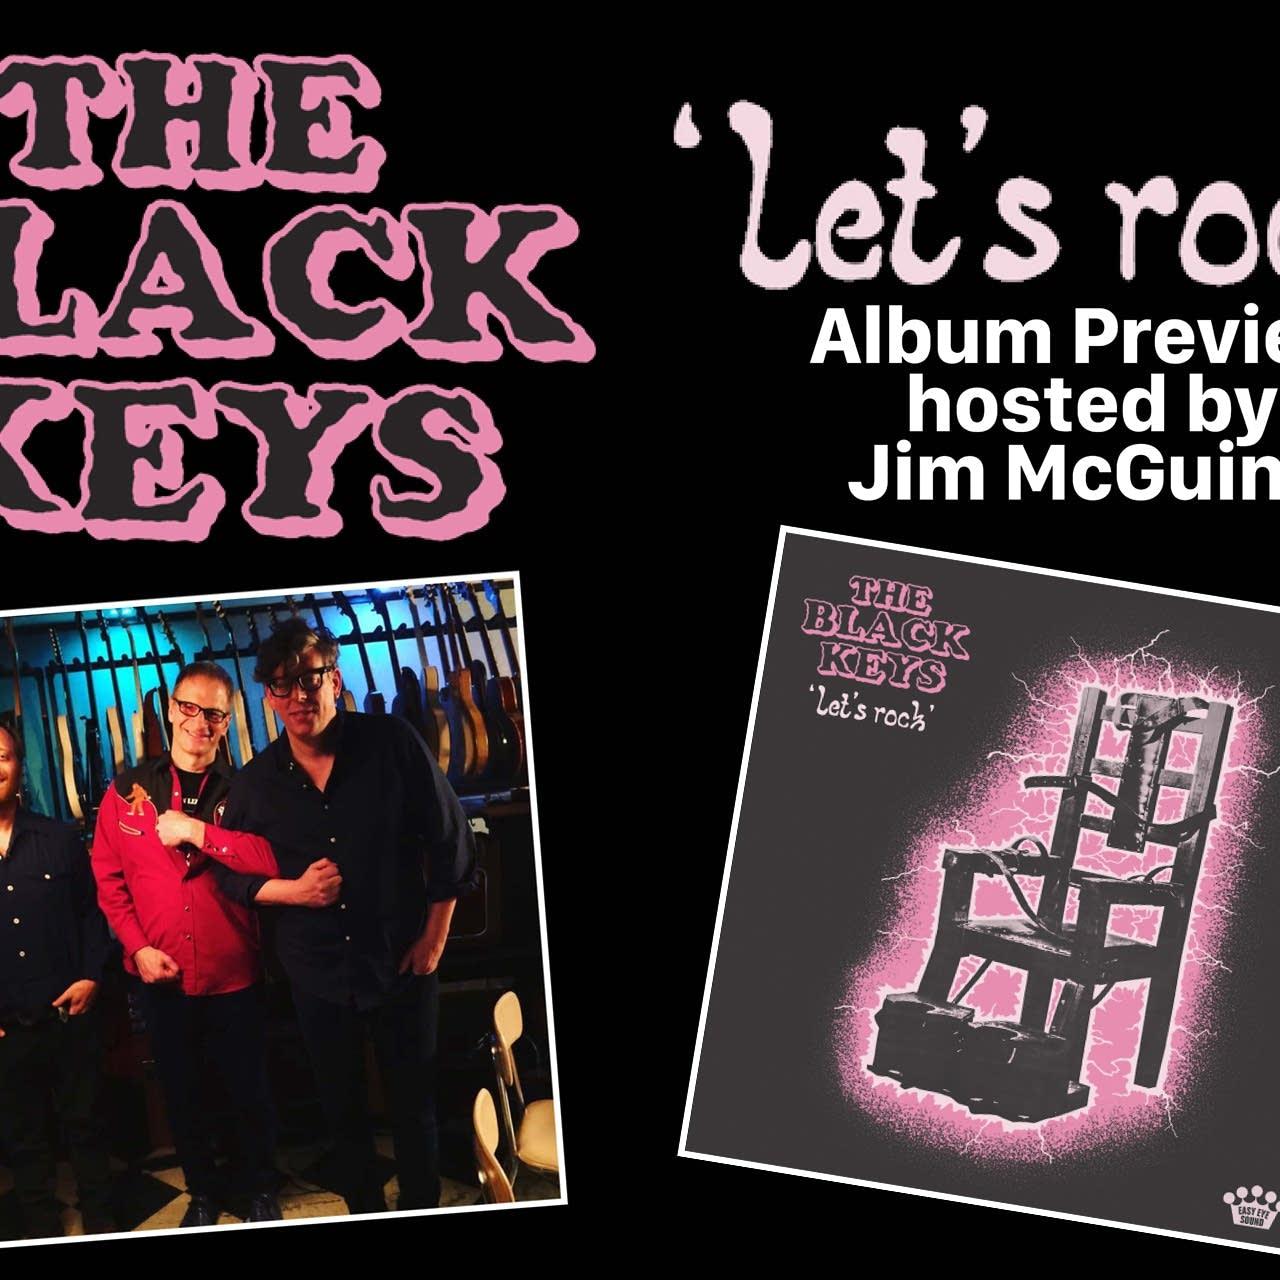 The Black Keys - Let's Rock album preview special